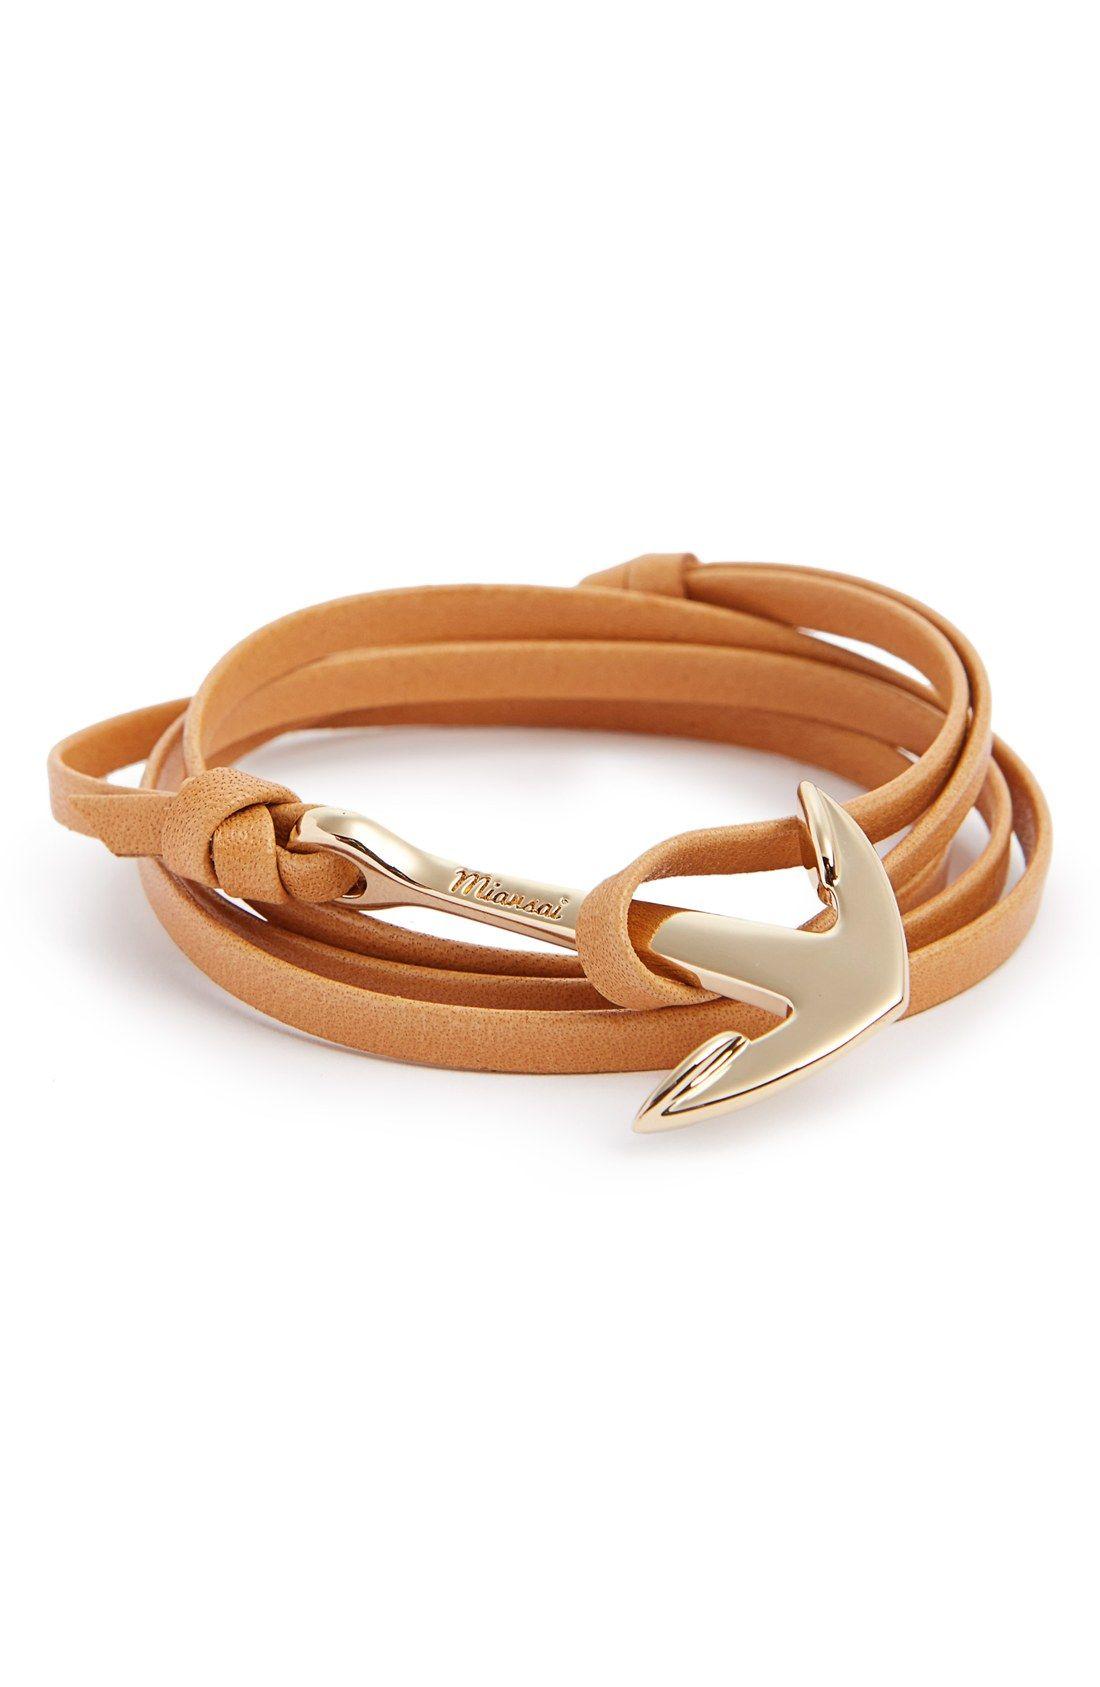 a27f0544ba78 Miansai Gold Anchor Leather Bracelet Tobilleras